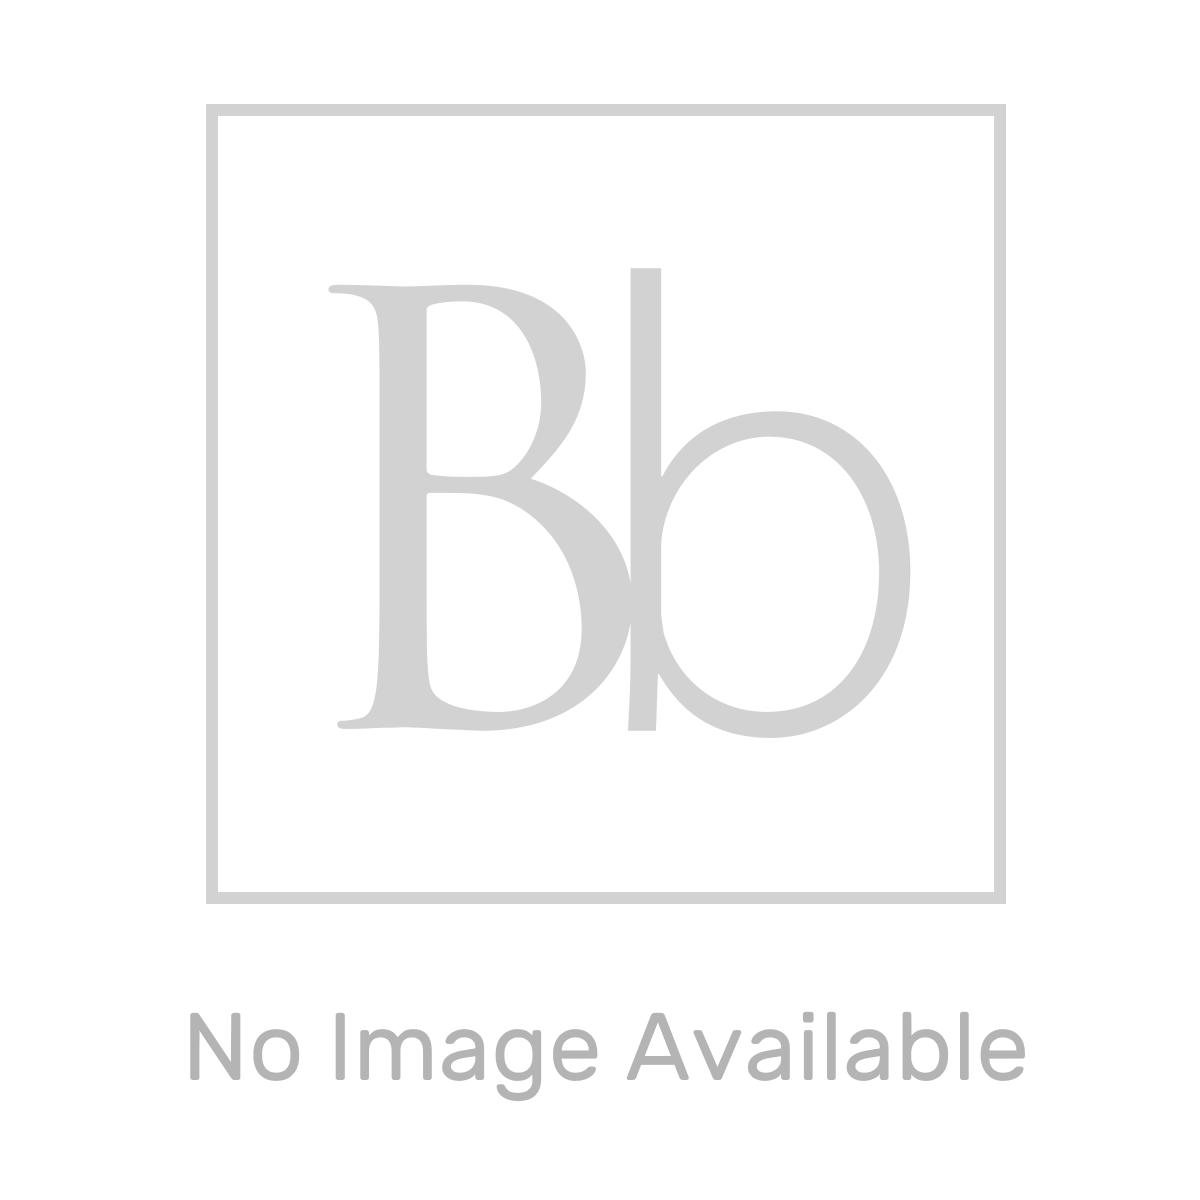 RAK Obelisk Ecofix White Cistern Cabinet Measurements